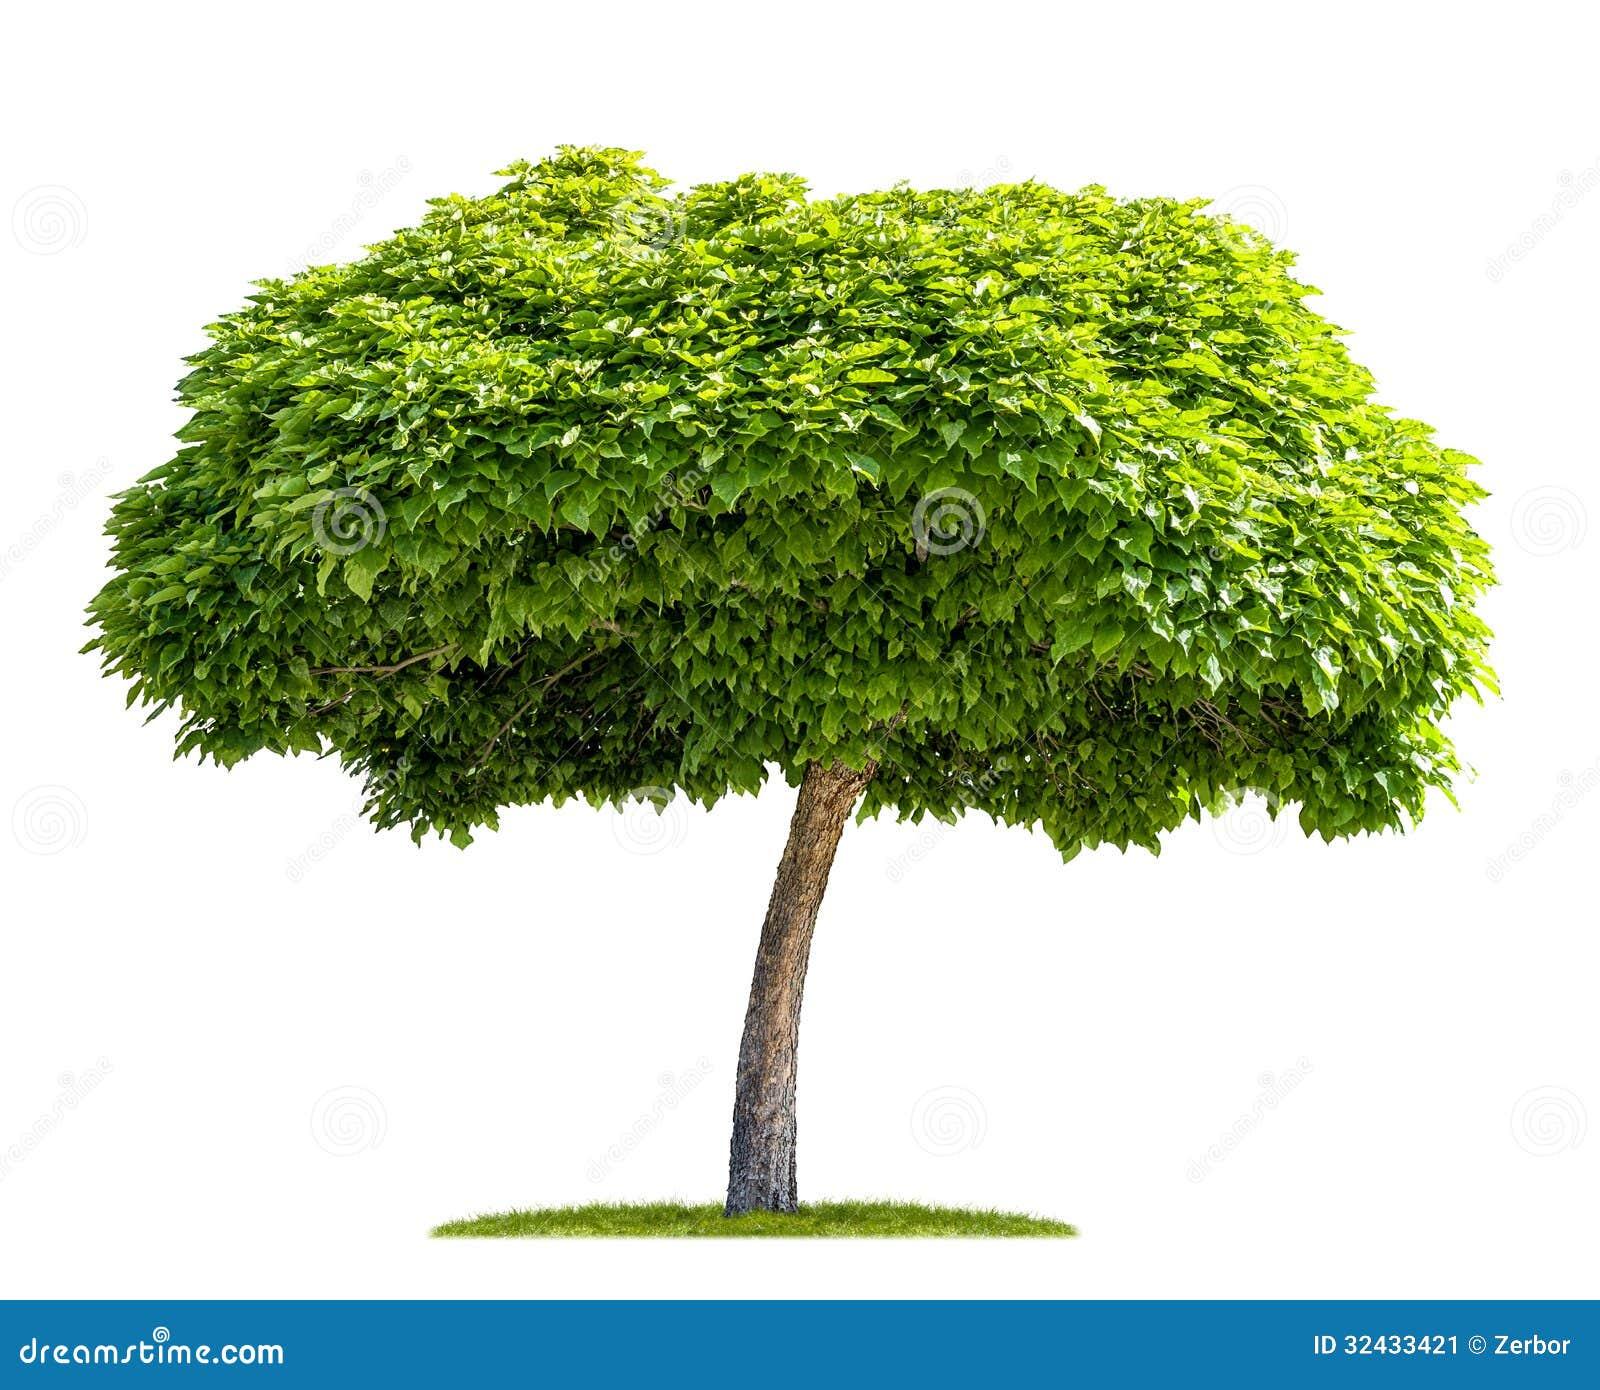 isolated catalpa tree stock image image 32433421. Black Bedroom Furniture Sets. Home Design Ideas